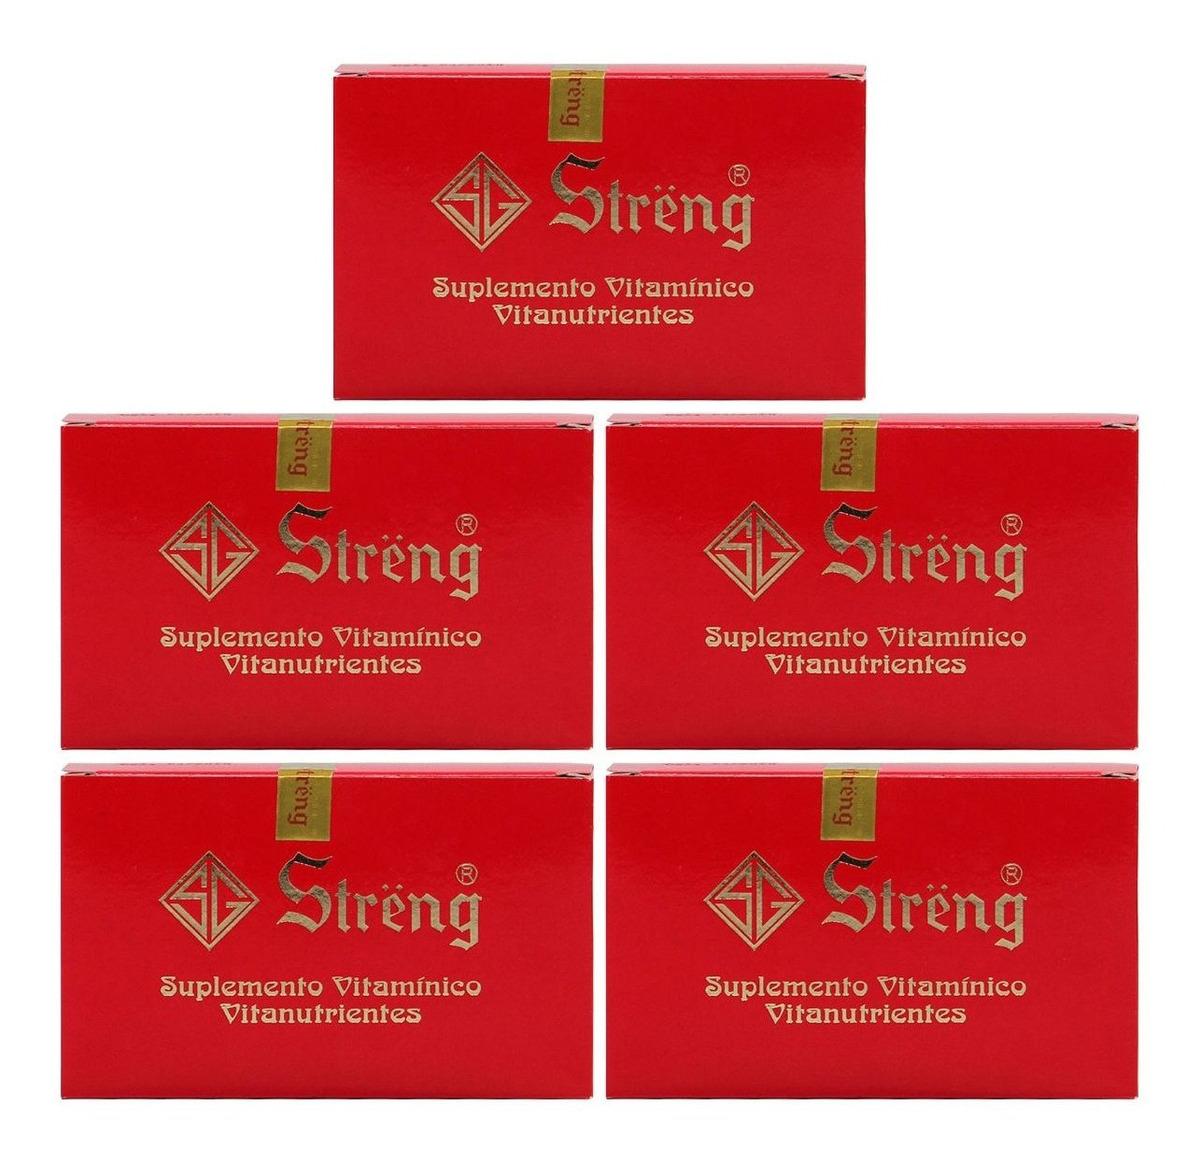 Streng Suplemento Vitaminico 16 Frascos 5ml Kit 5 Unidades